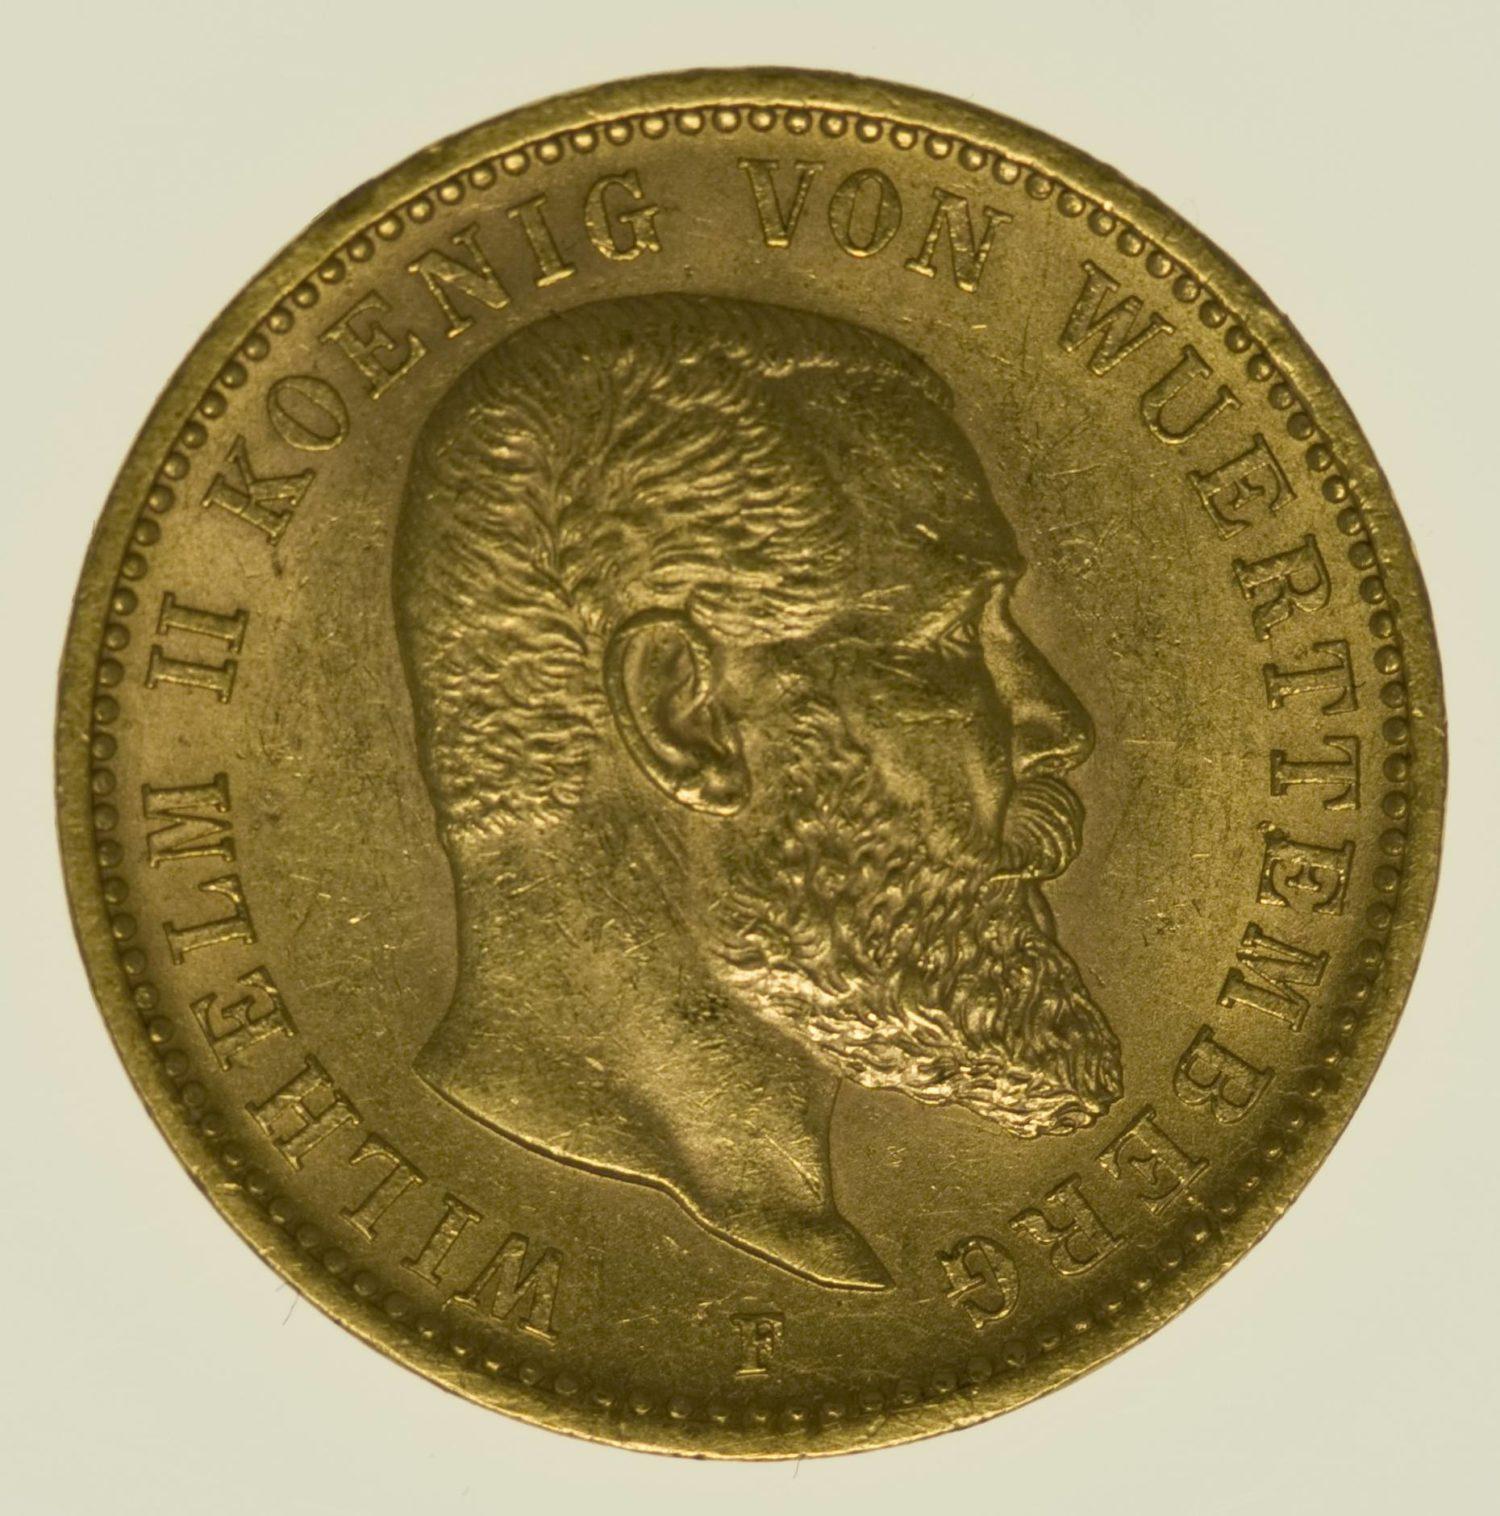 Württemberg Wilhelm II 20 Mark 1900 Gold 7,16 Gramm fein RAR